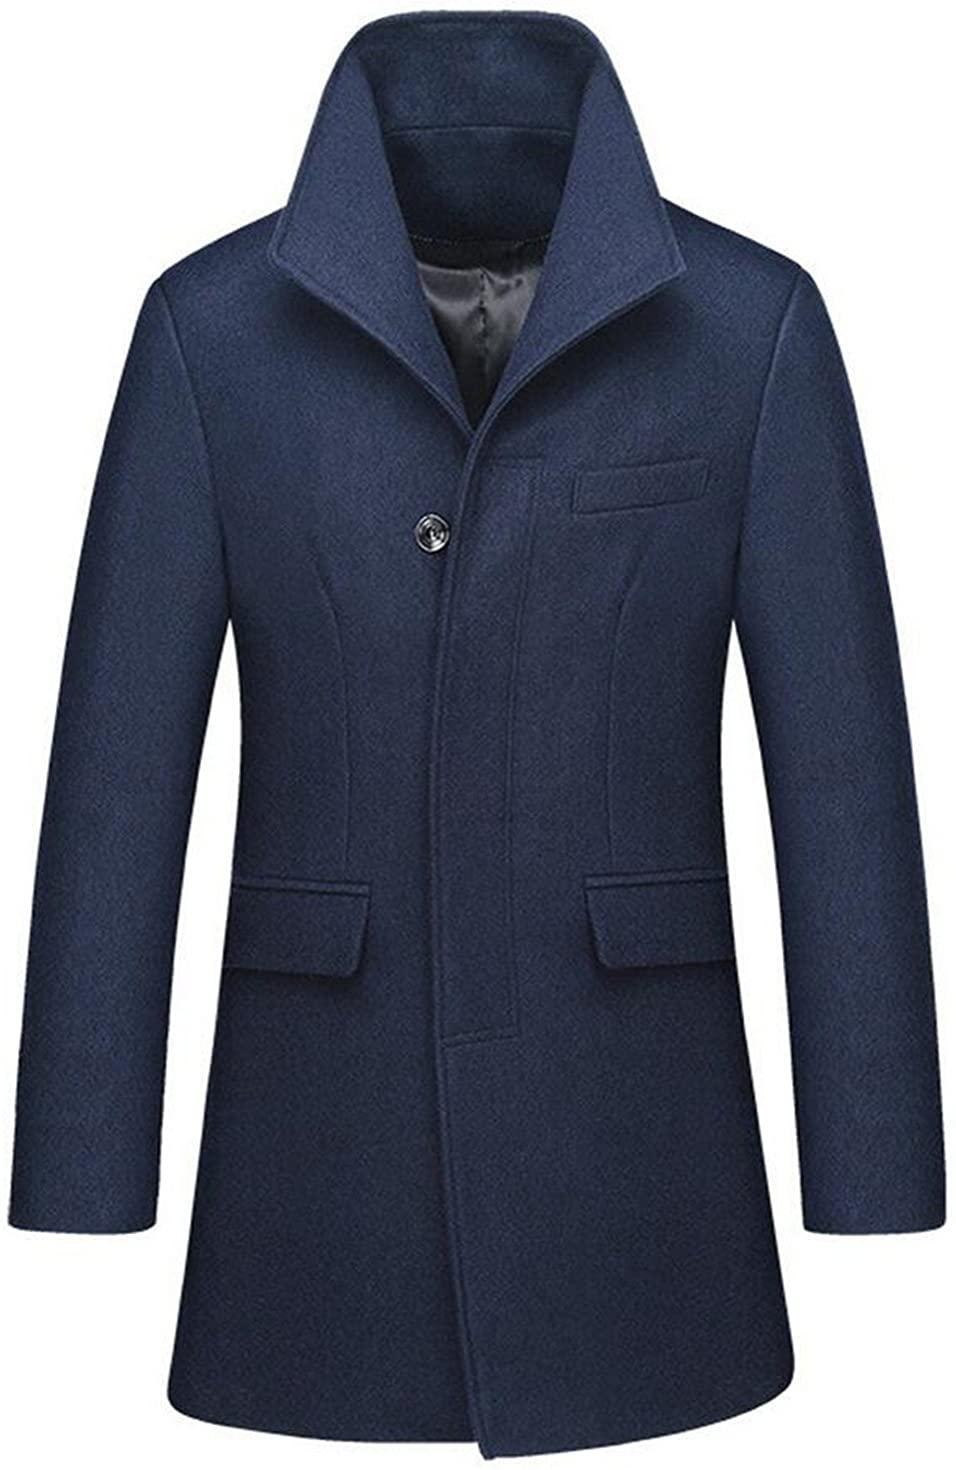 JEWOSOR Mens Fashion Wool Slim Fit Long Business Coat Winter Wool Jacket Overcoat Trench Peacoat